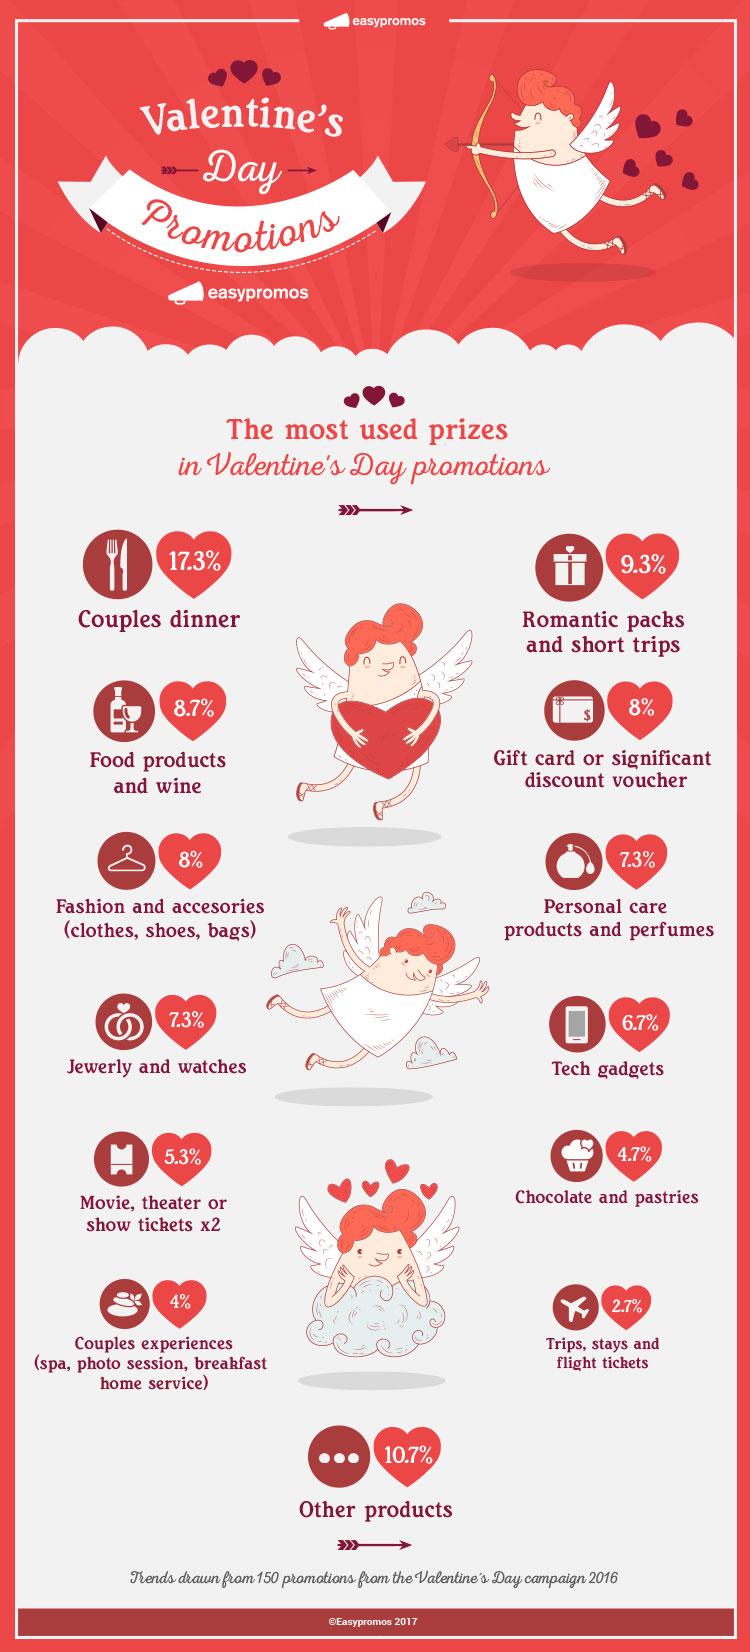 Valentine's Day promotion prizes